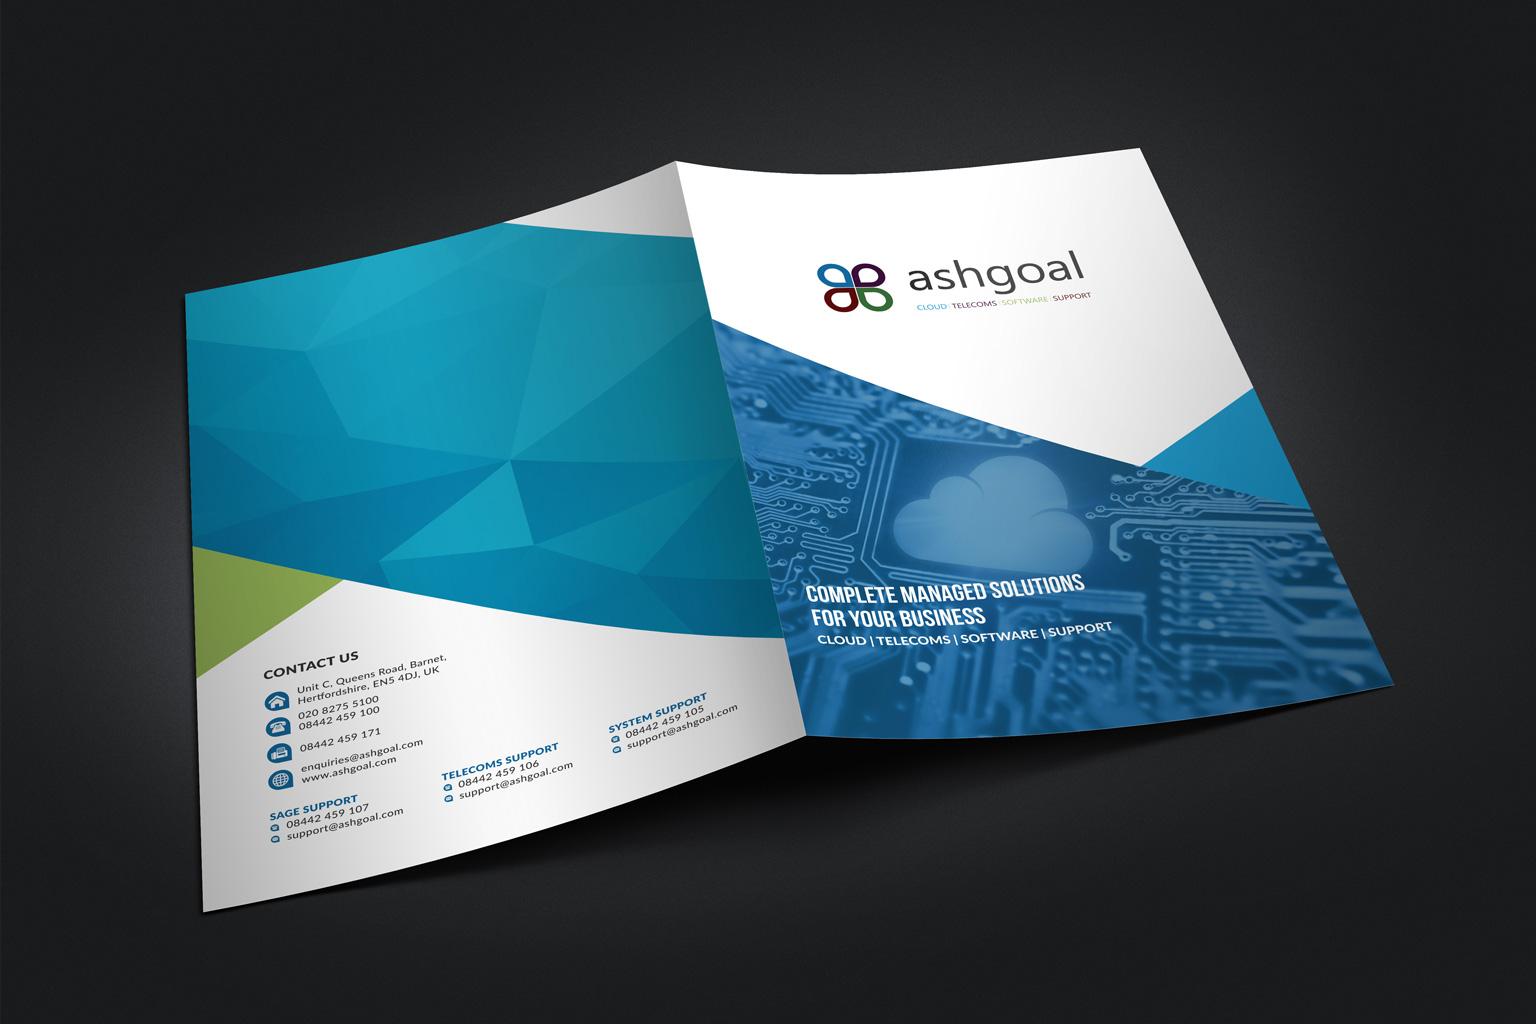 Ashgoal-folder-out